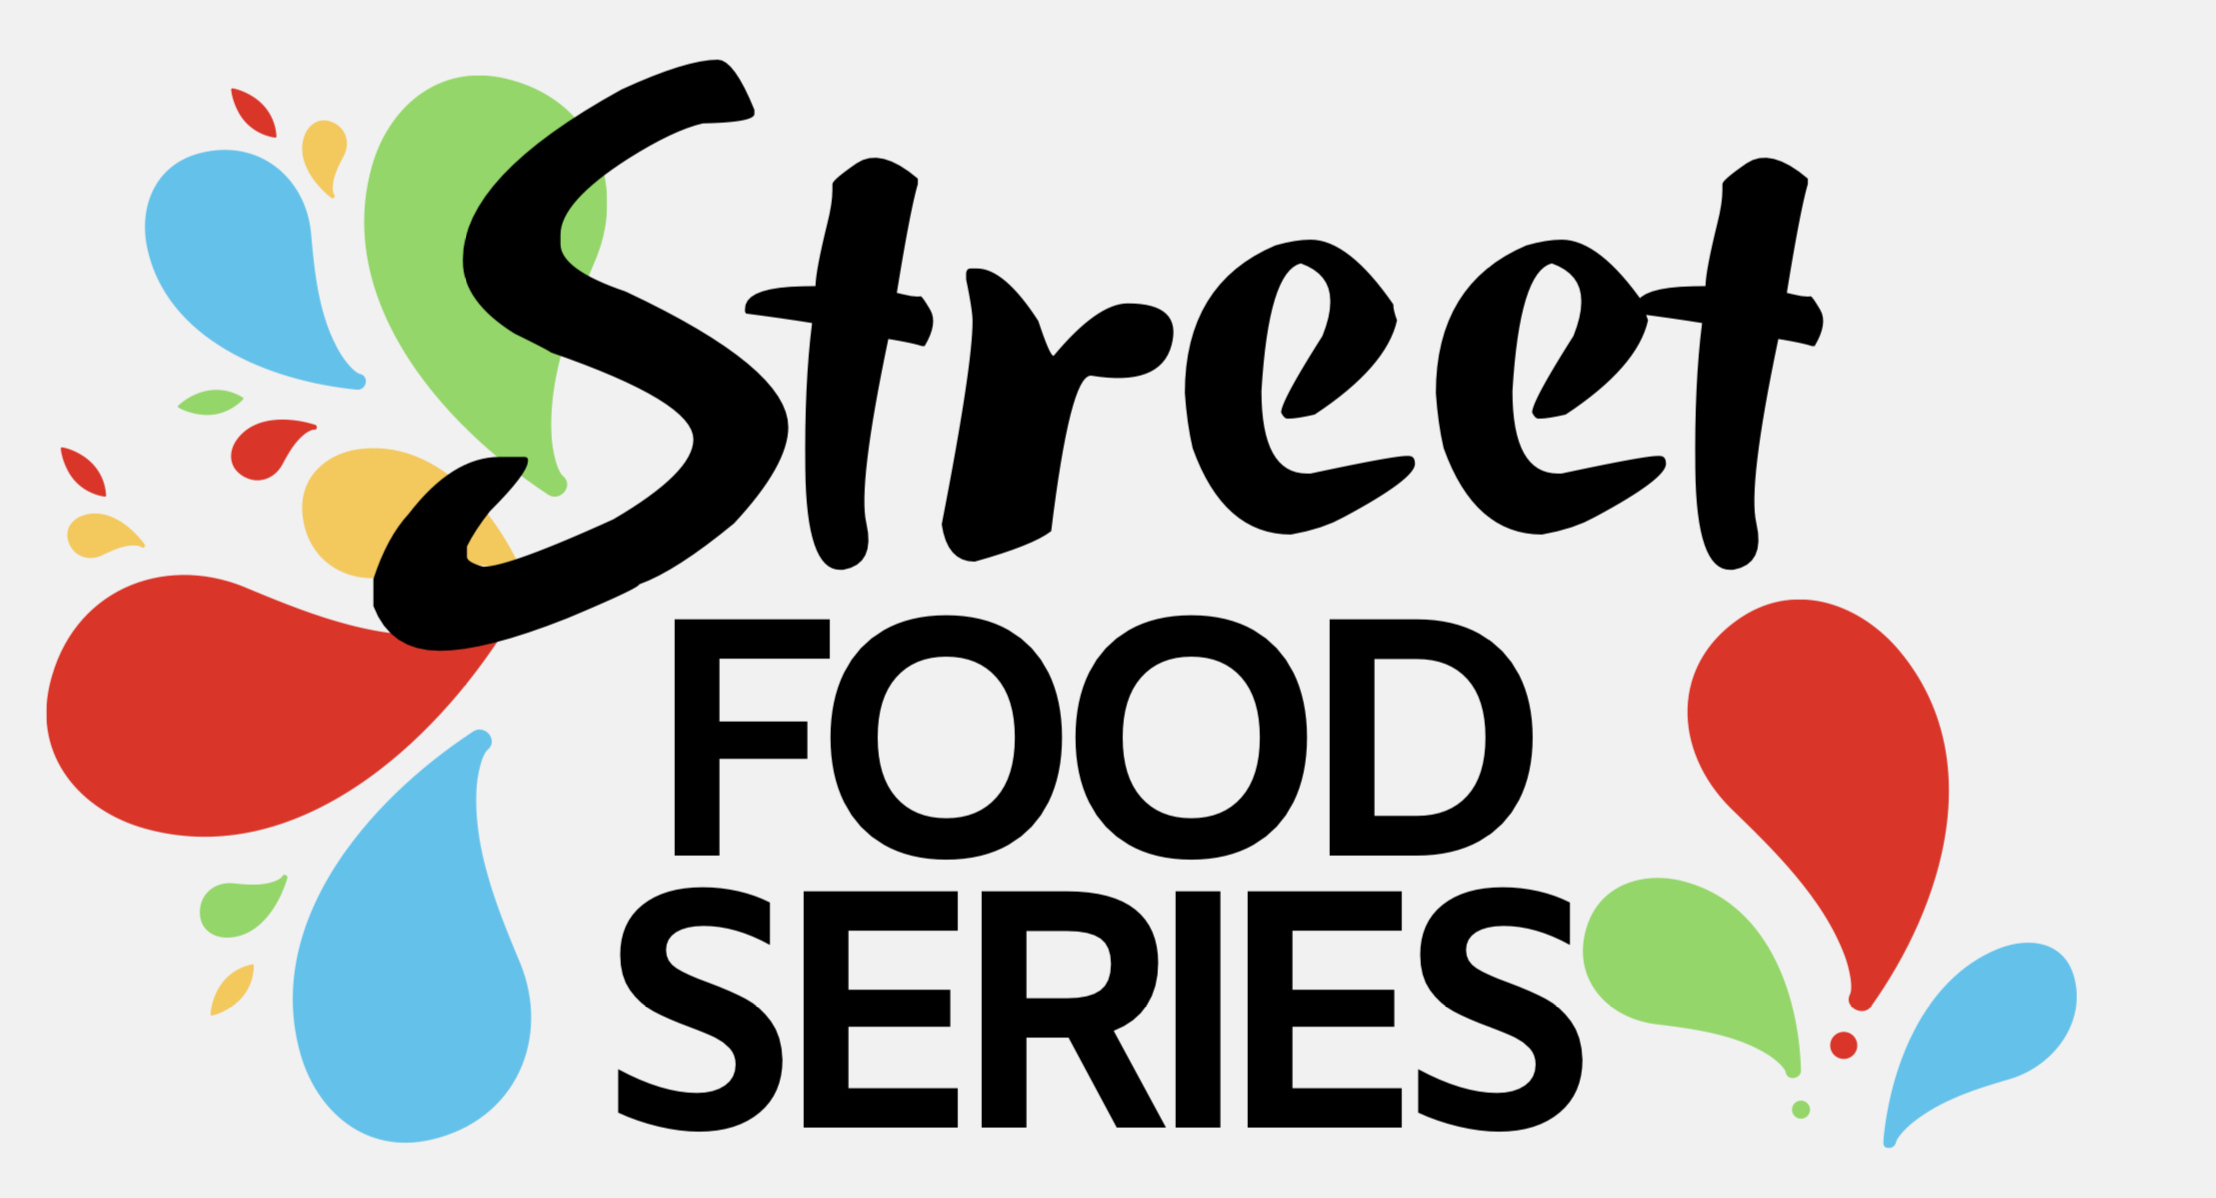 International Street Food series